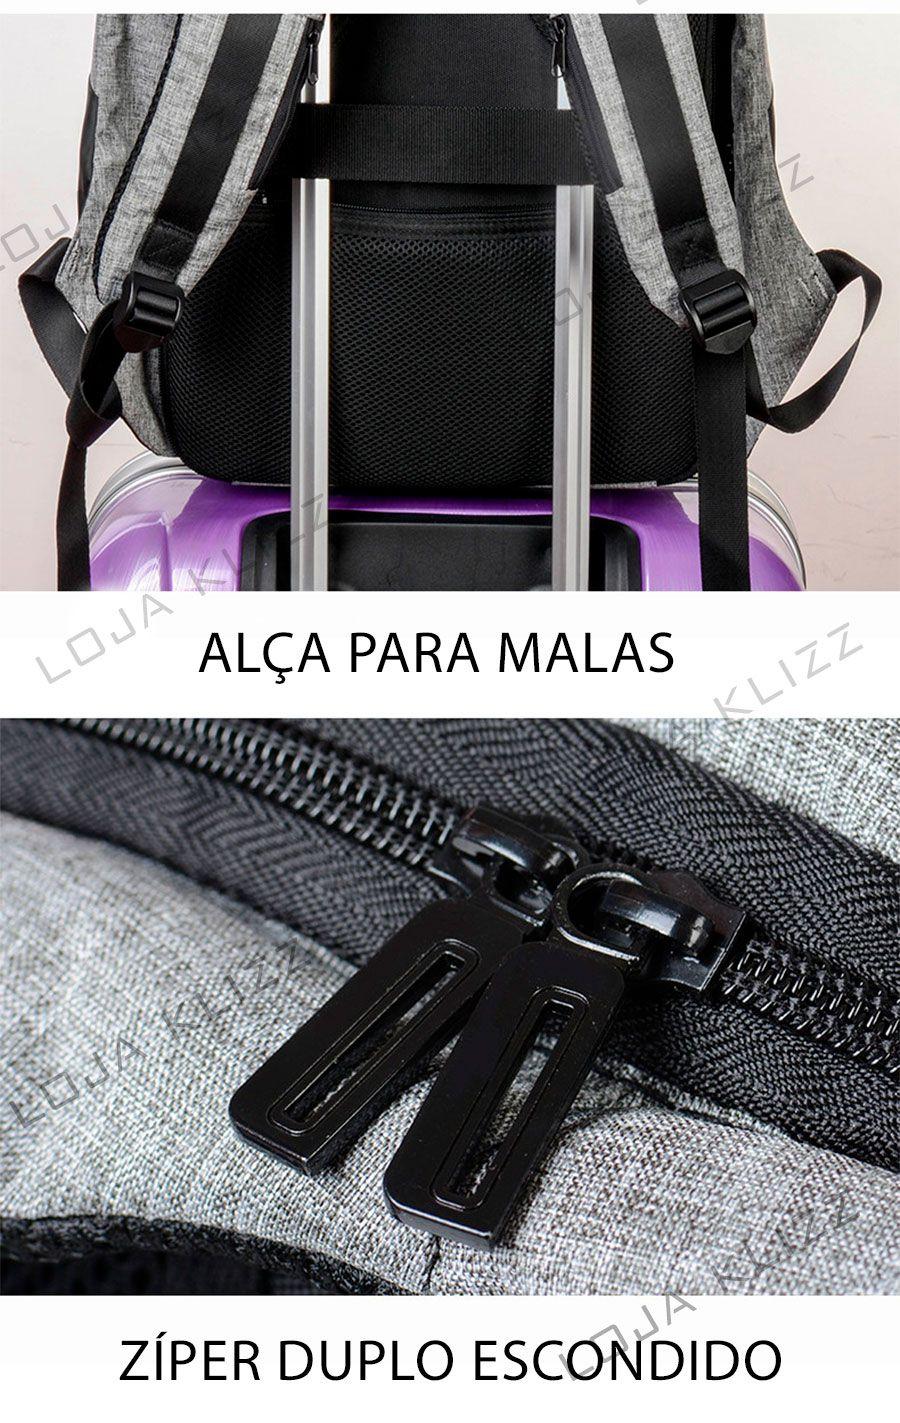 Mochila Antifurto Svviss Usb Notebook Saida P2 Fone De Ouvido Impermeável  - KLIZZ